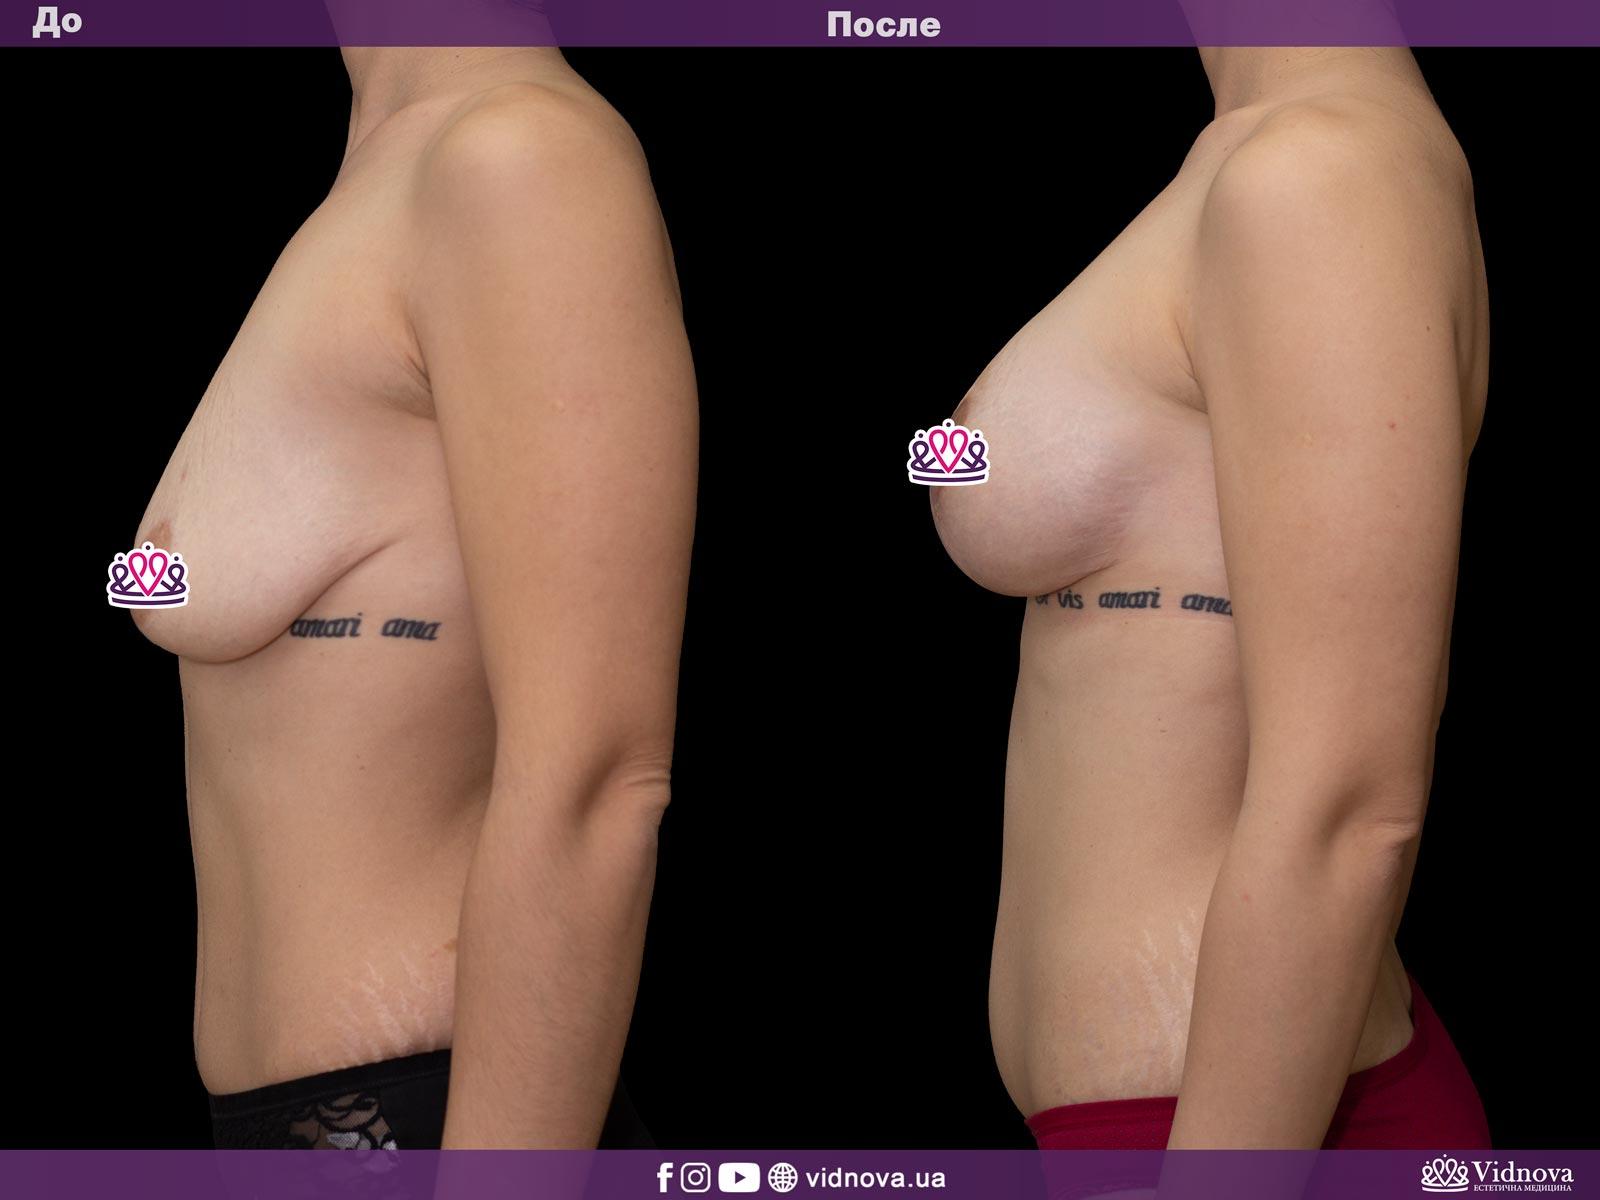 Подтяжка груди: Фото ДО и ПОСЛЕ - Пример №14-3 - Клиника Vidnova